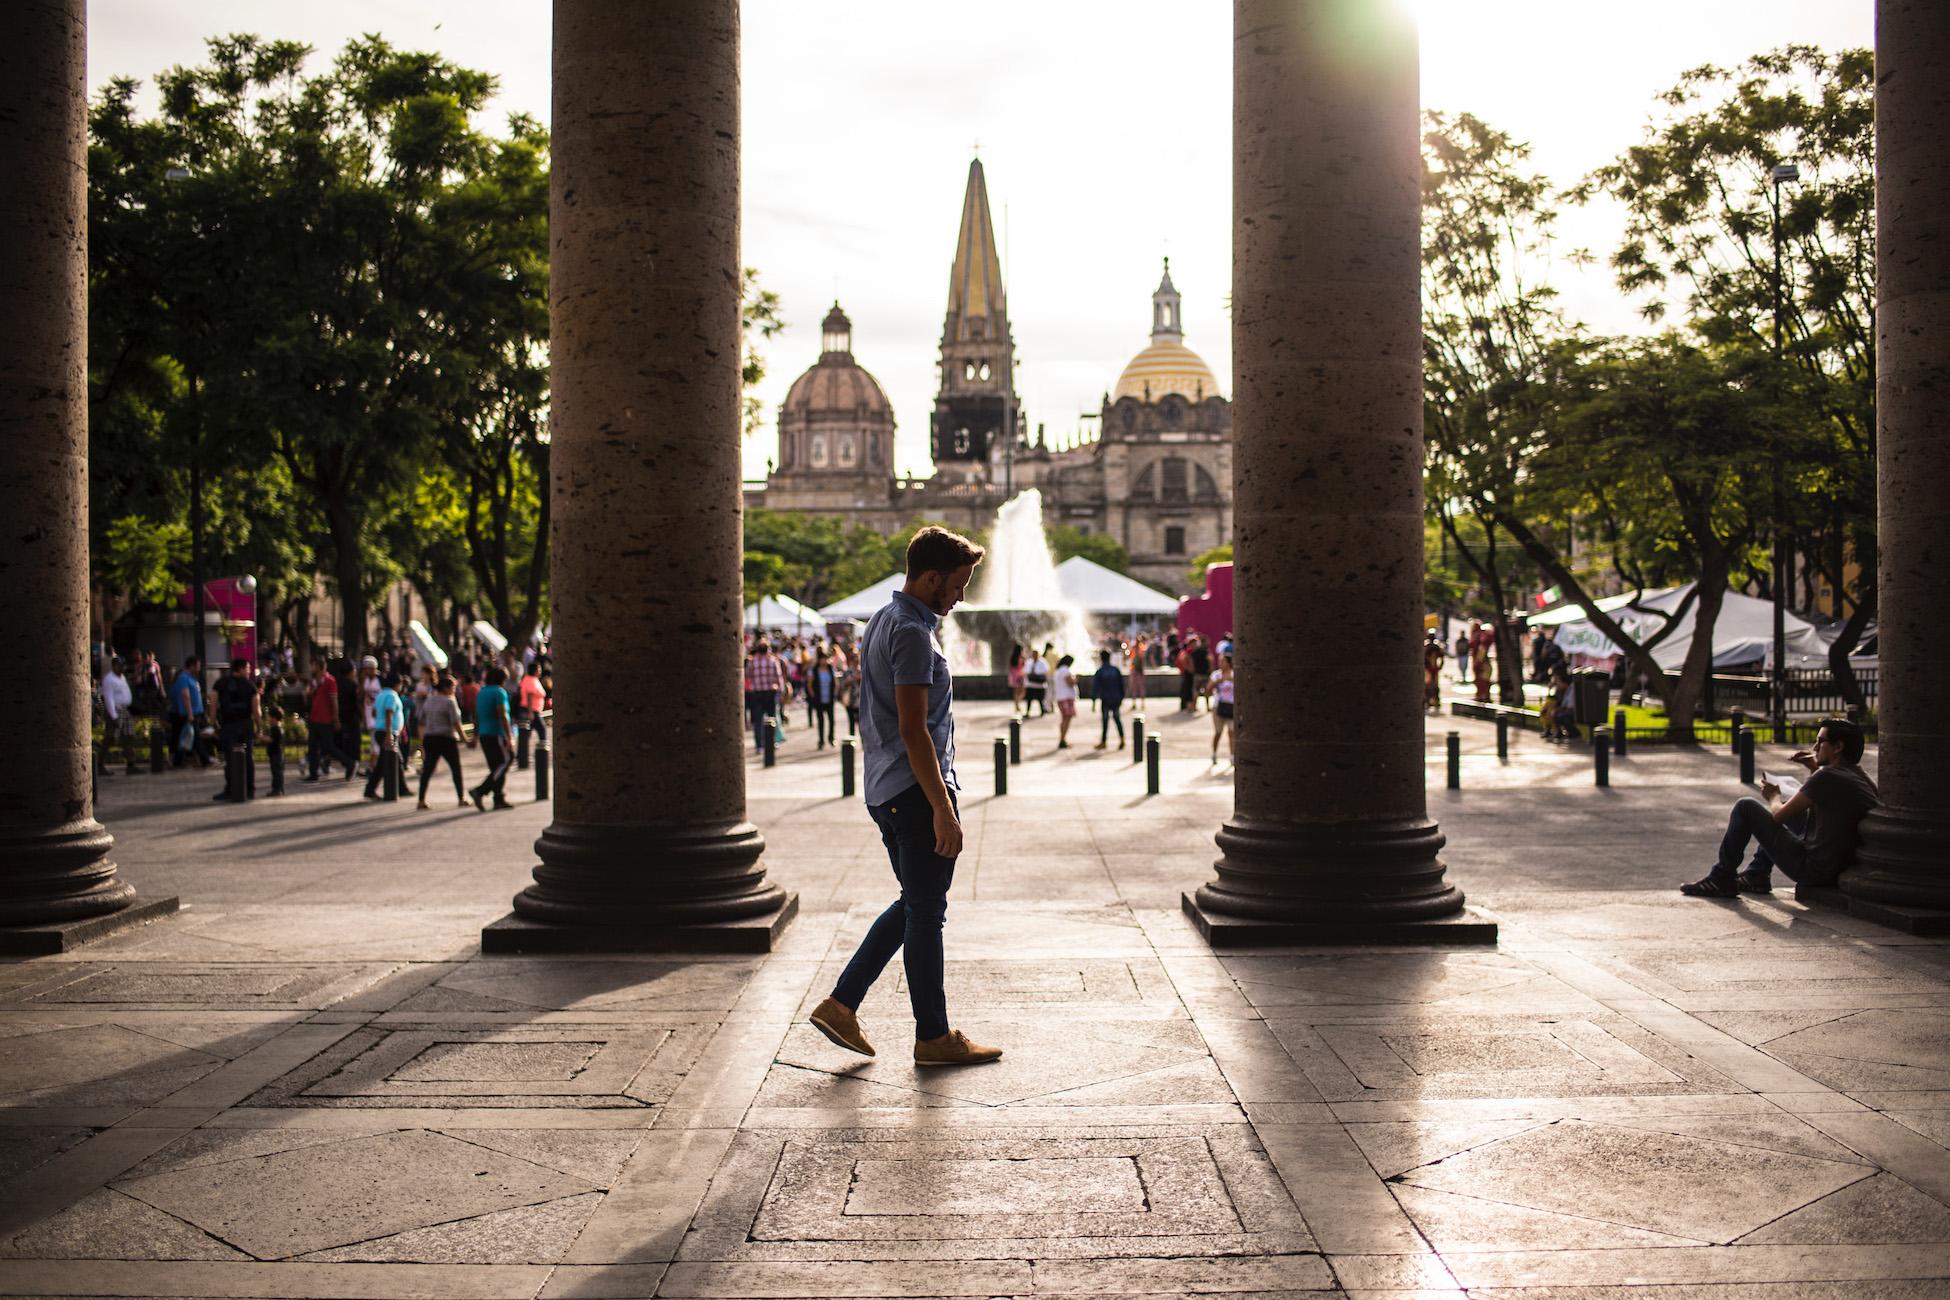 Robert Schrader in Guadalajara, Mexico